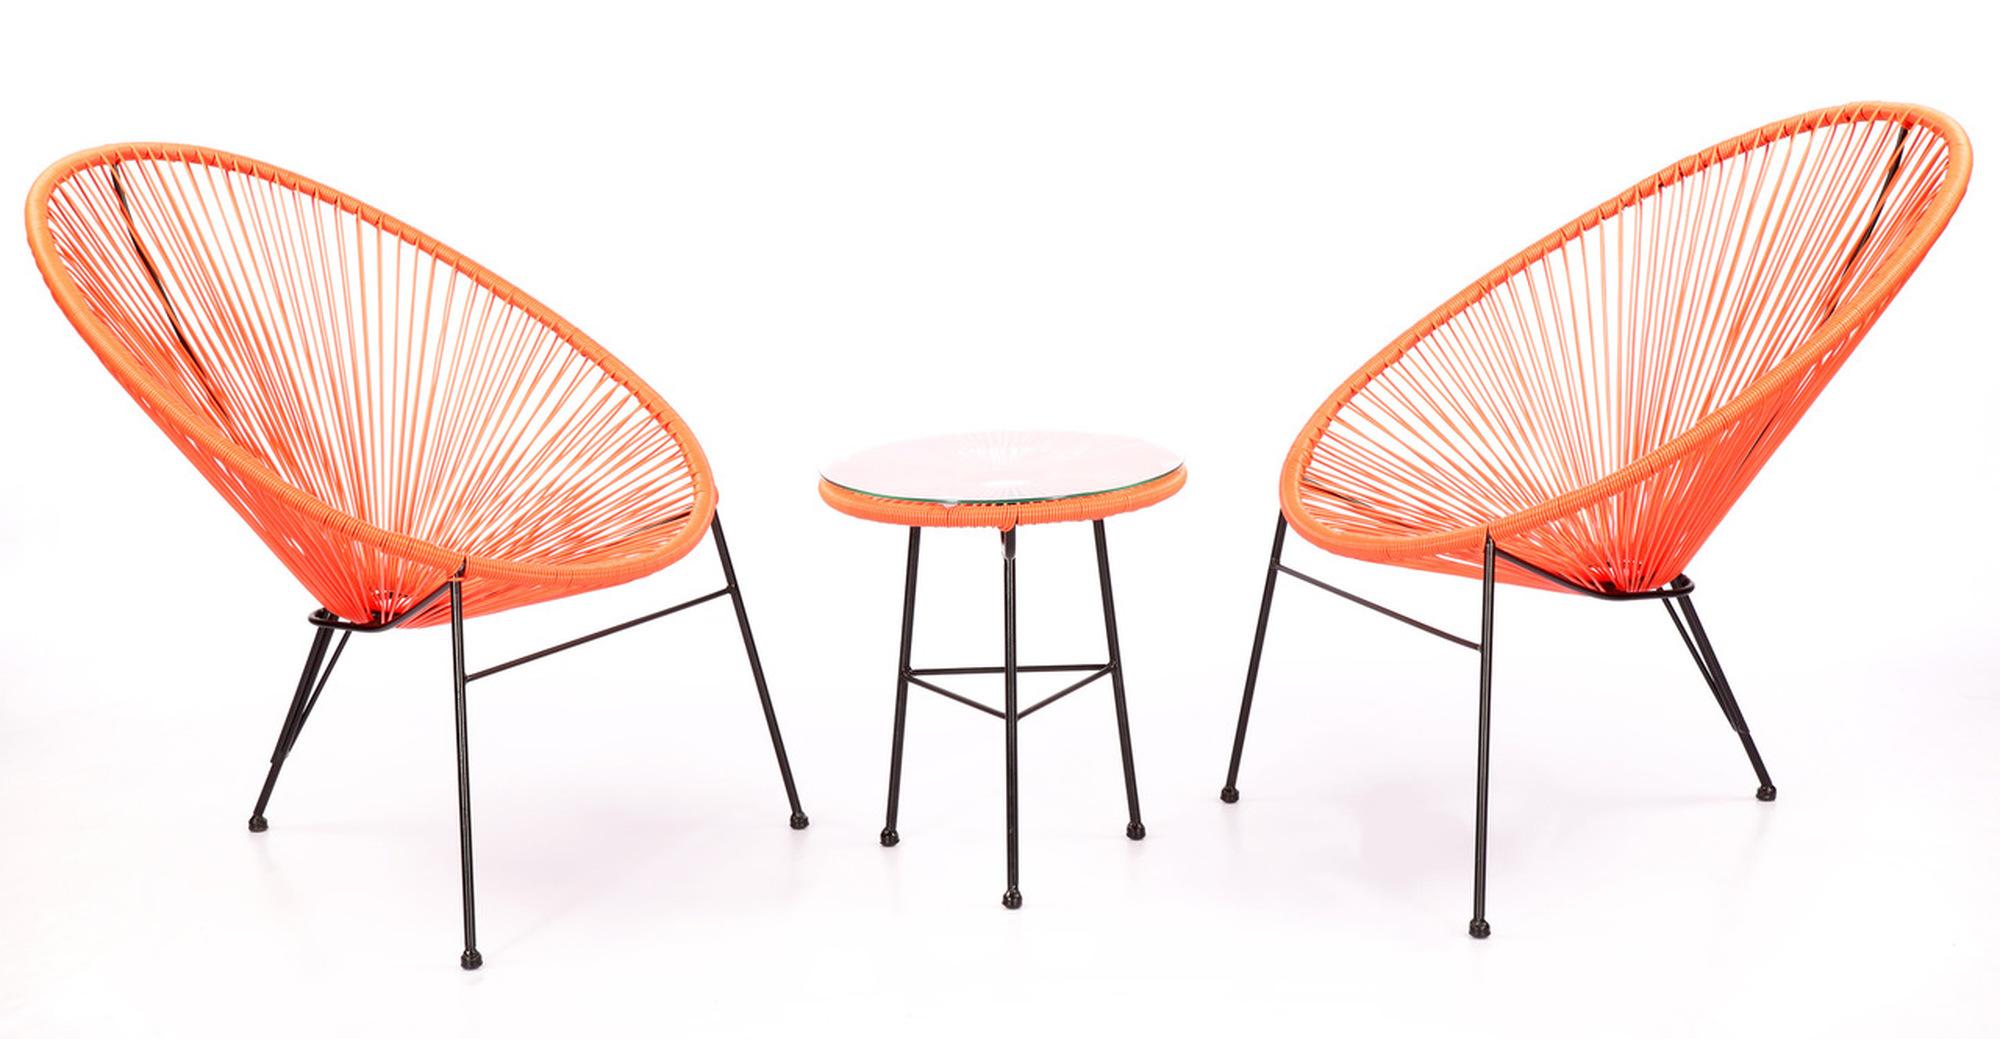 Acapulco Chairs & Table, Orange